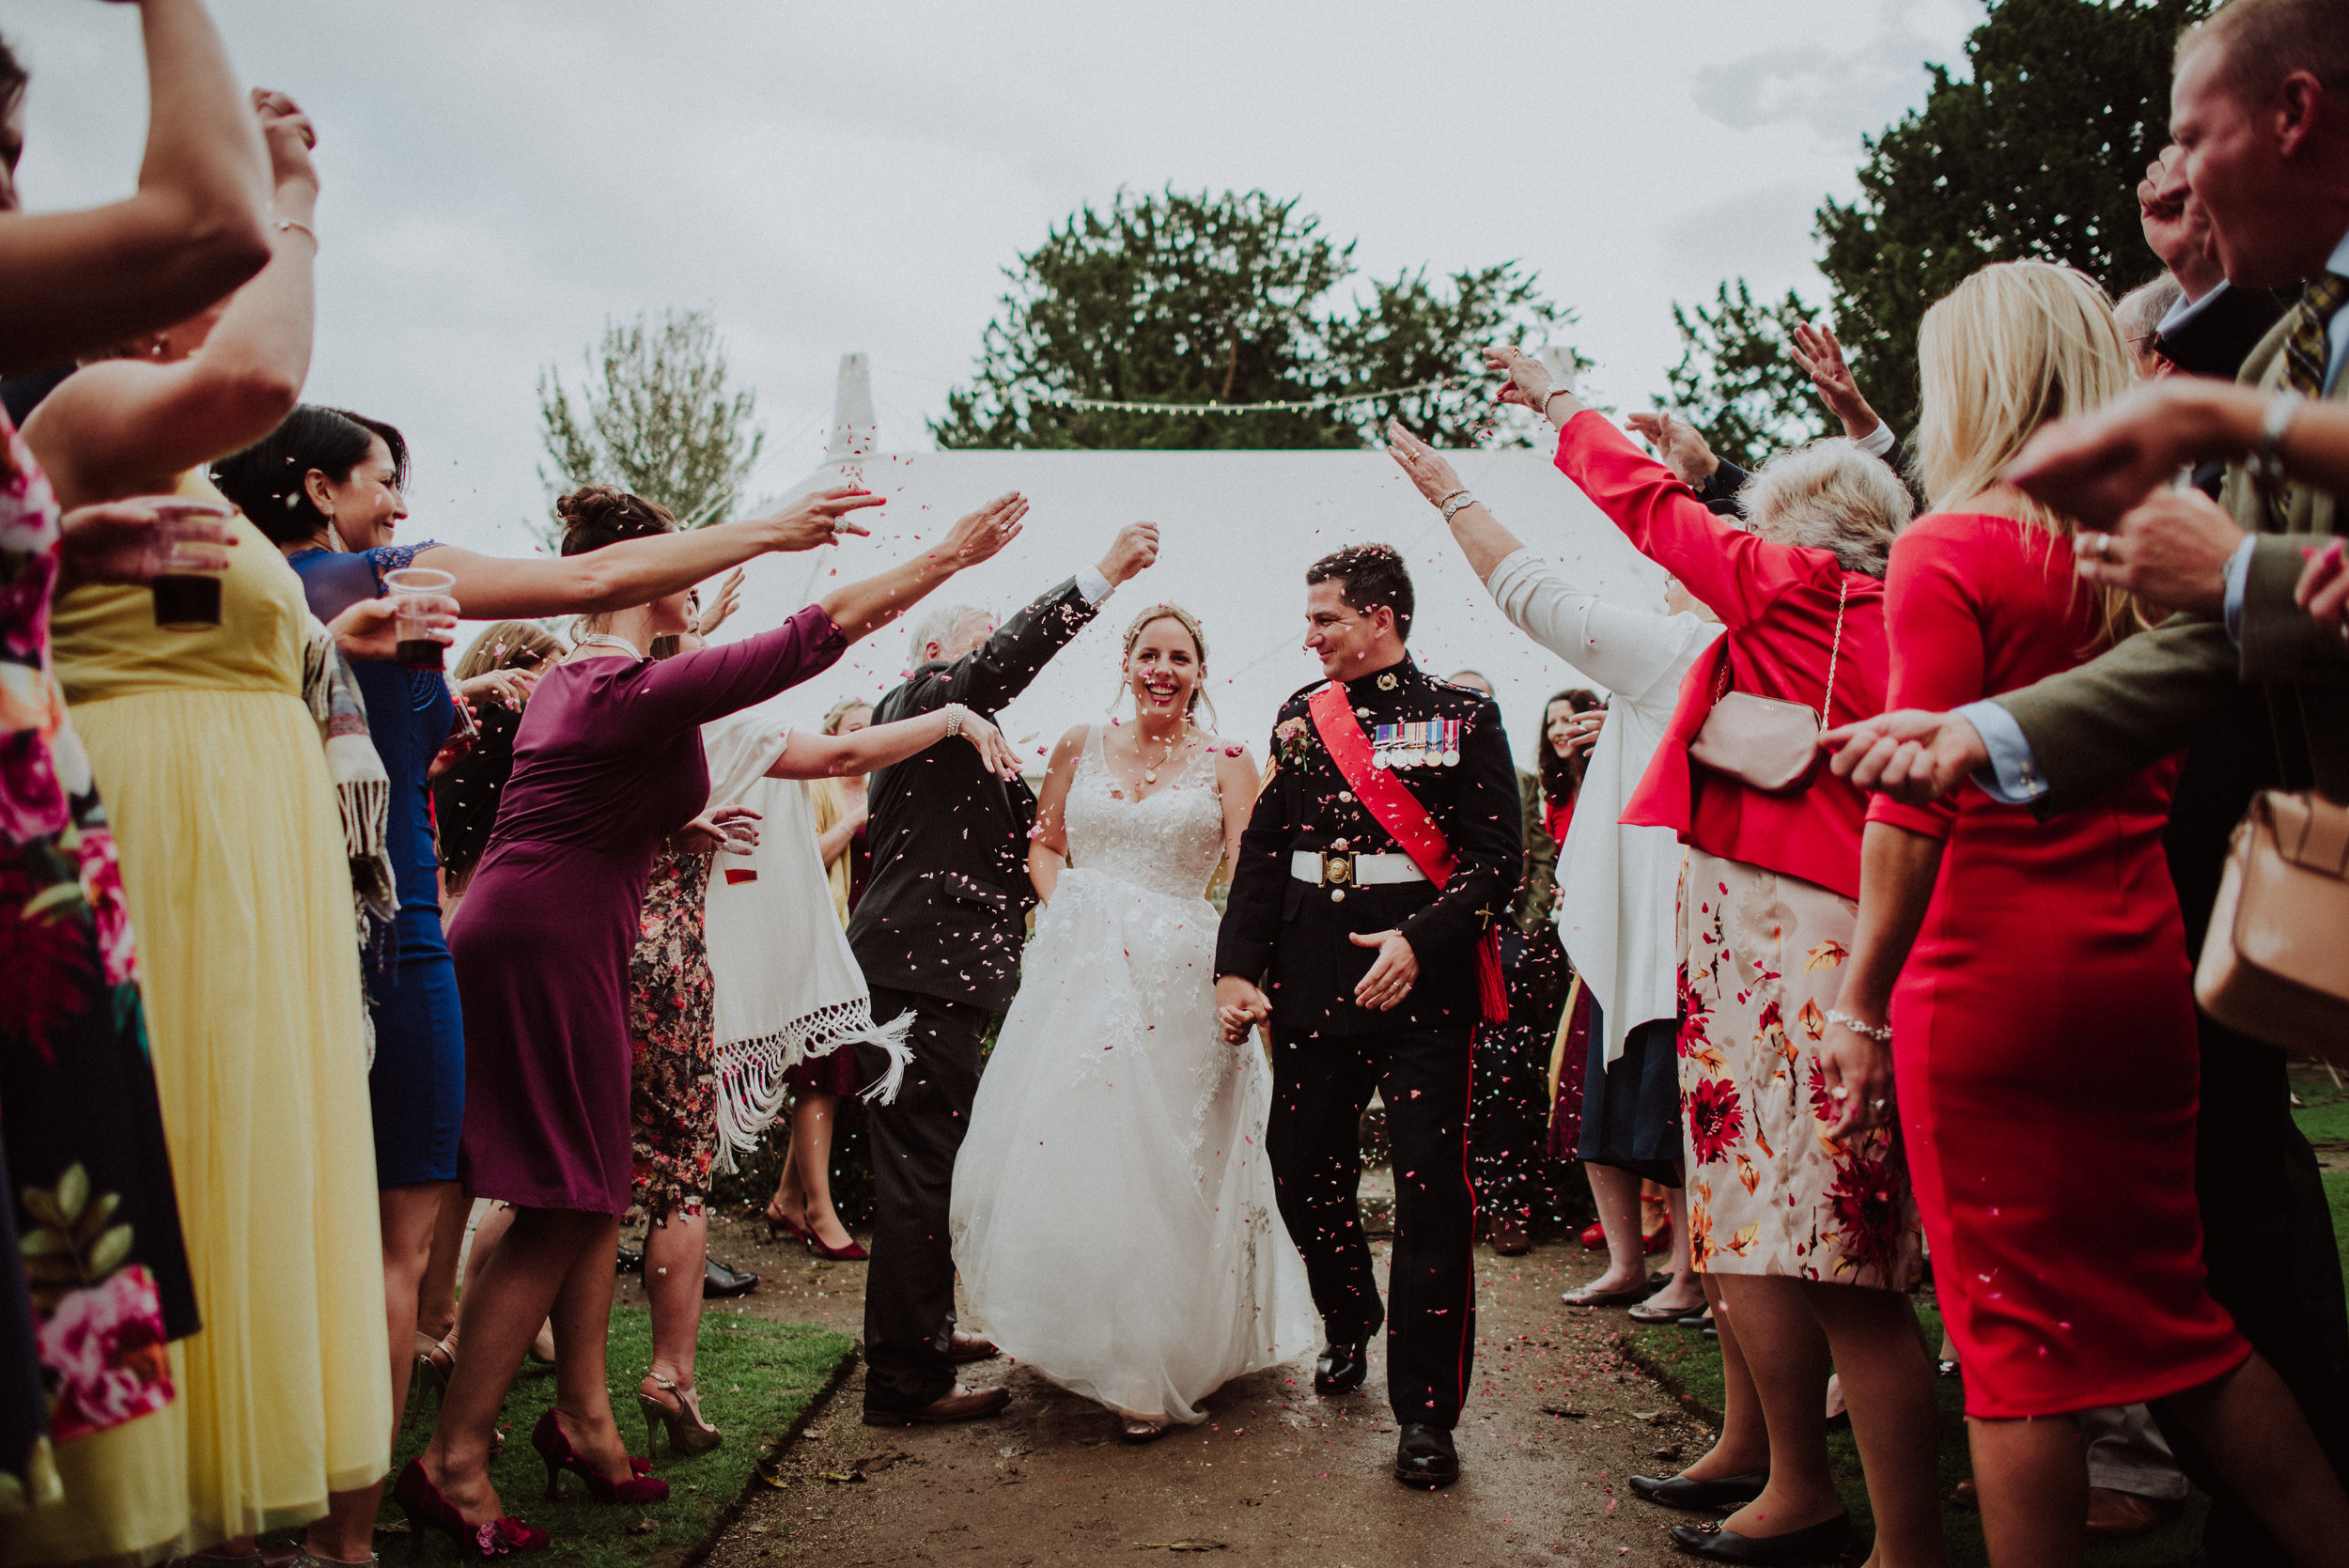 port-eliot-wedding-photographer-63.jpg